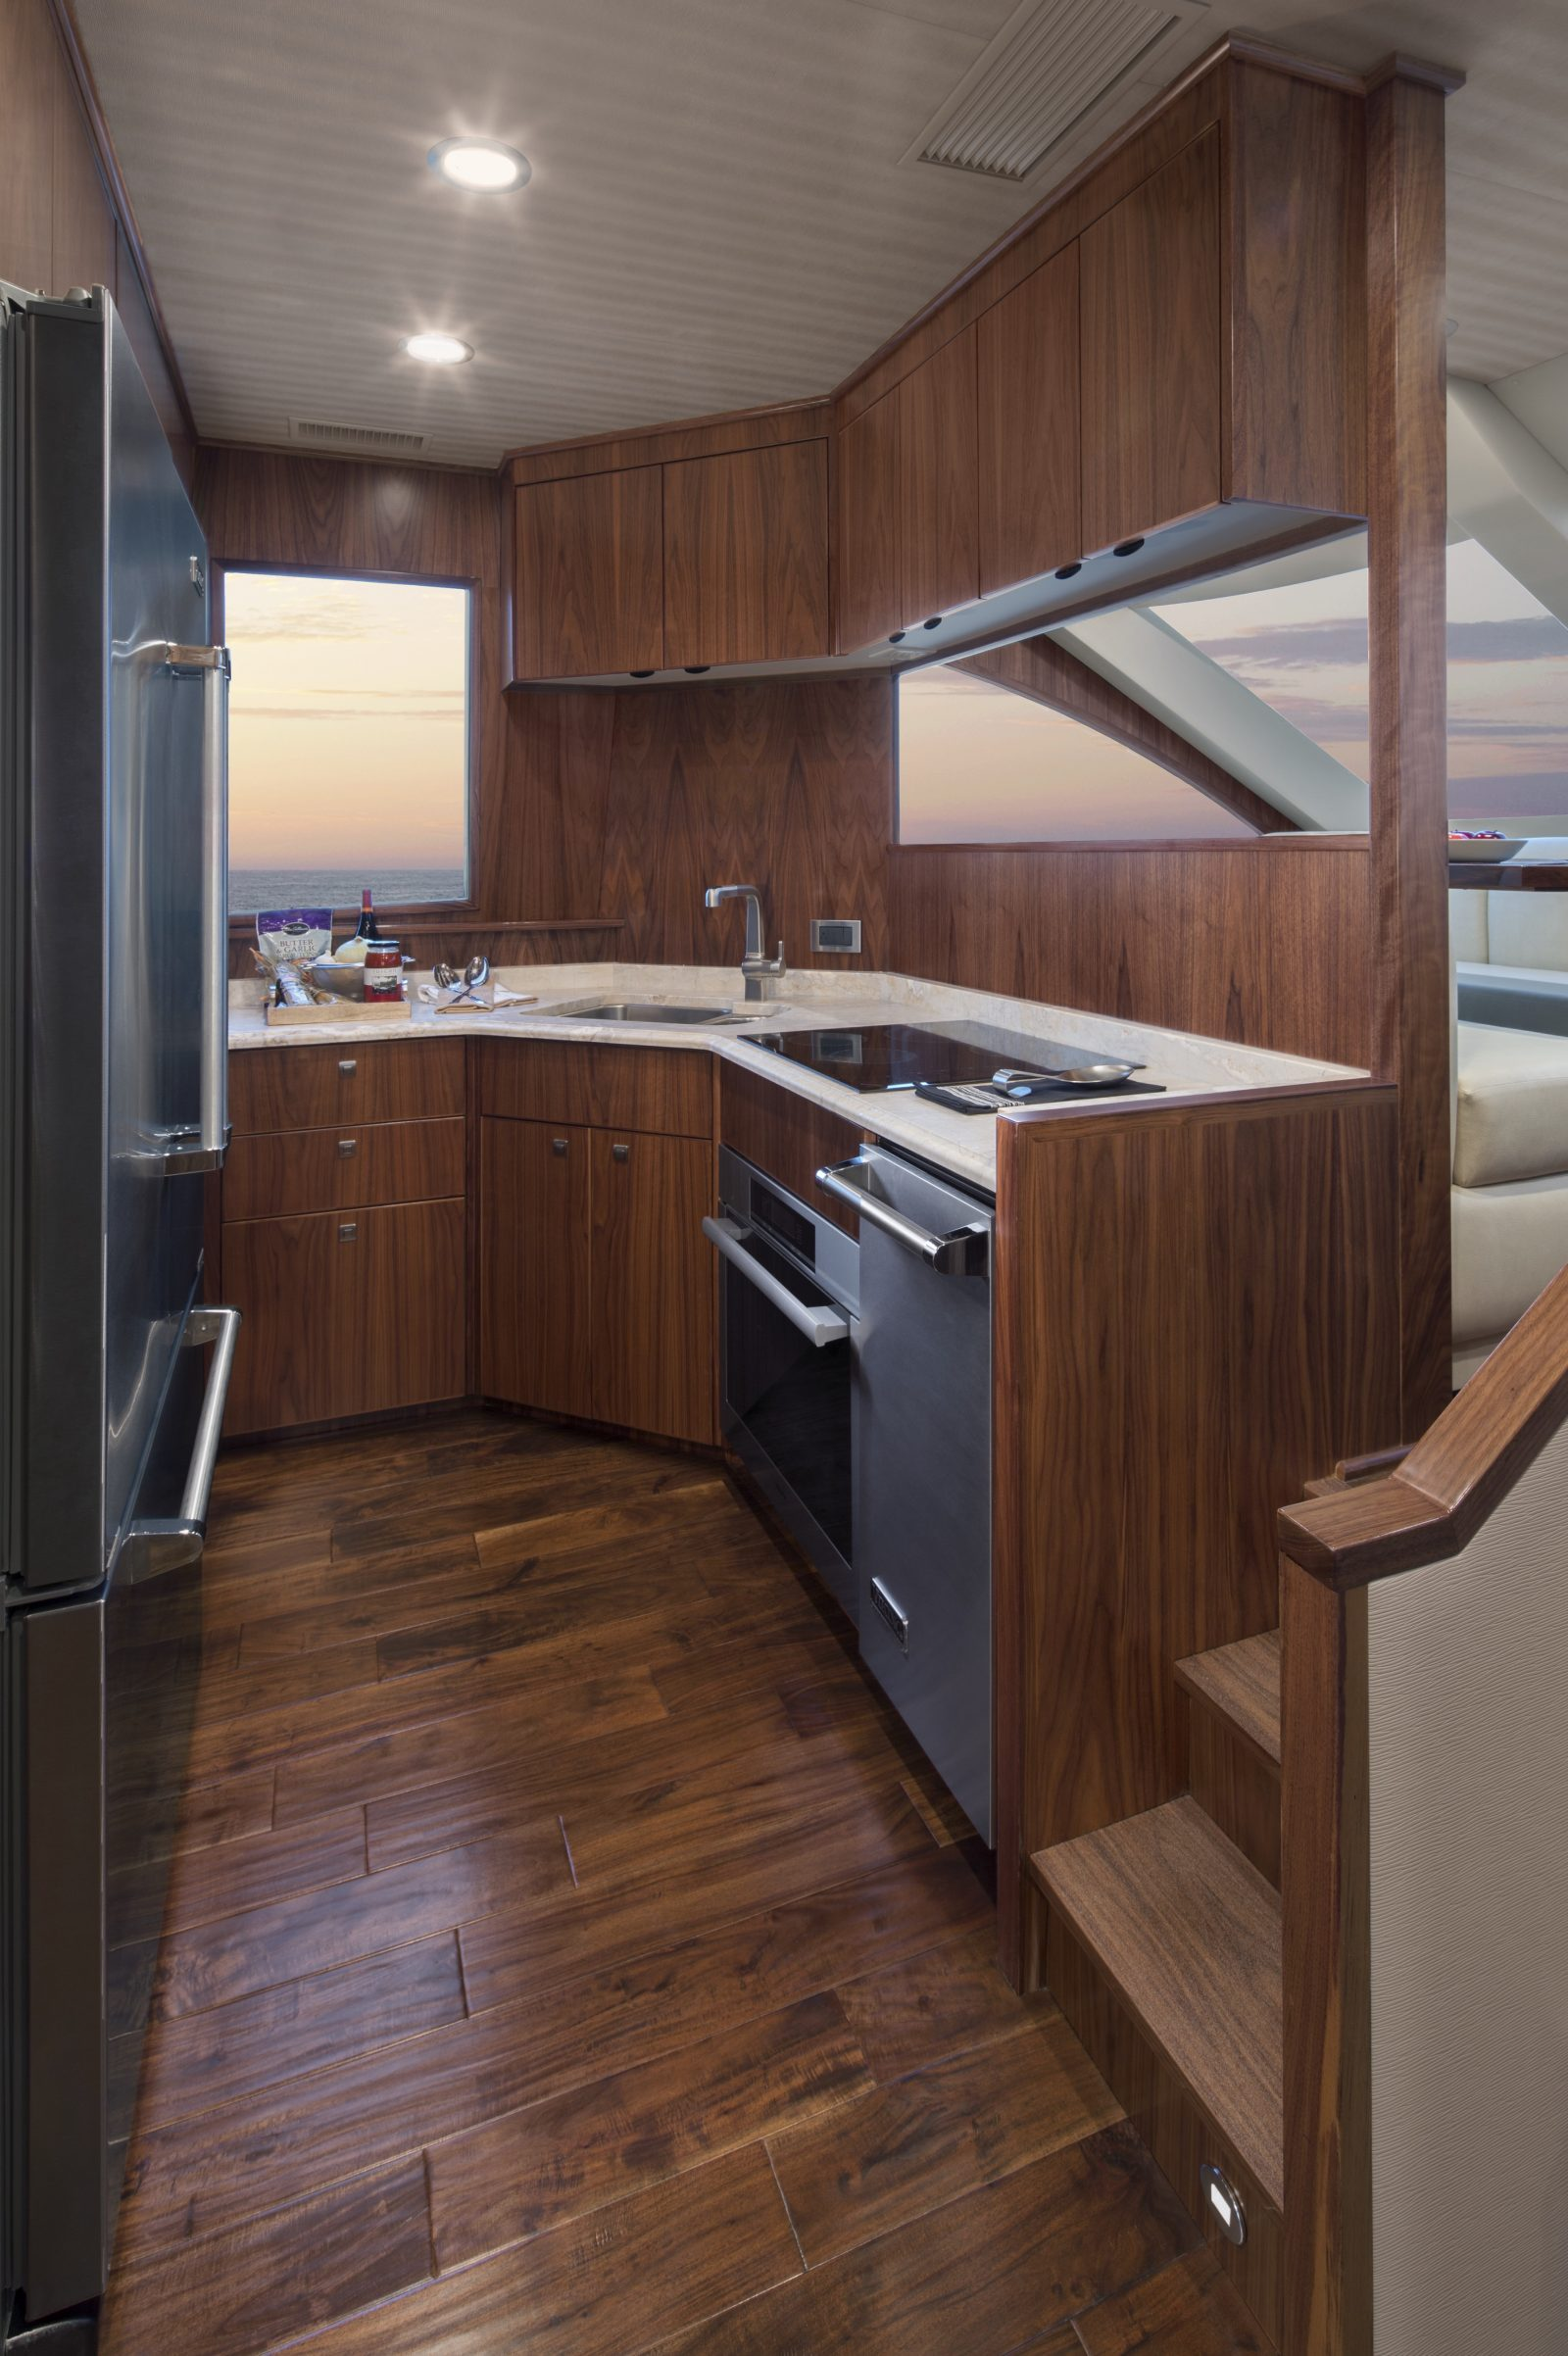 75my18 | 75 Motor Yacht